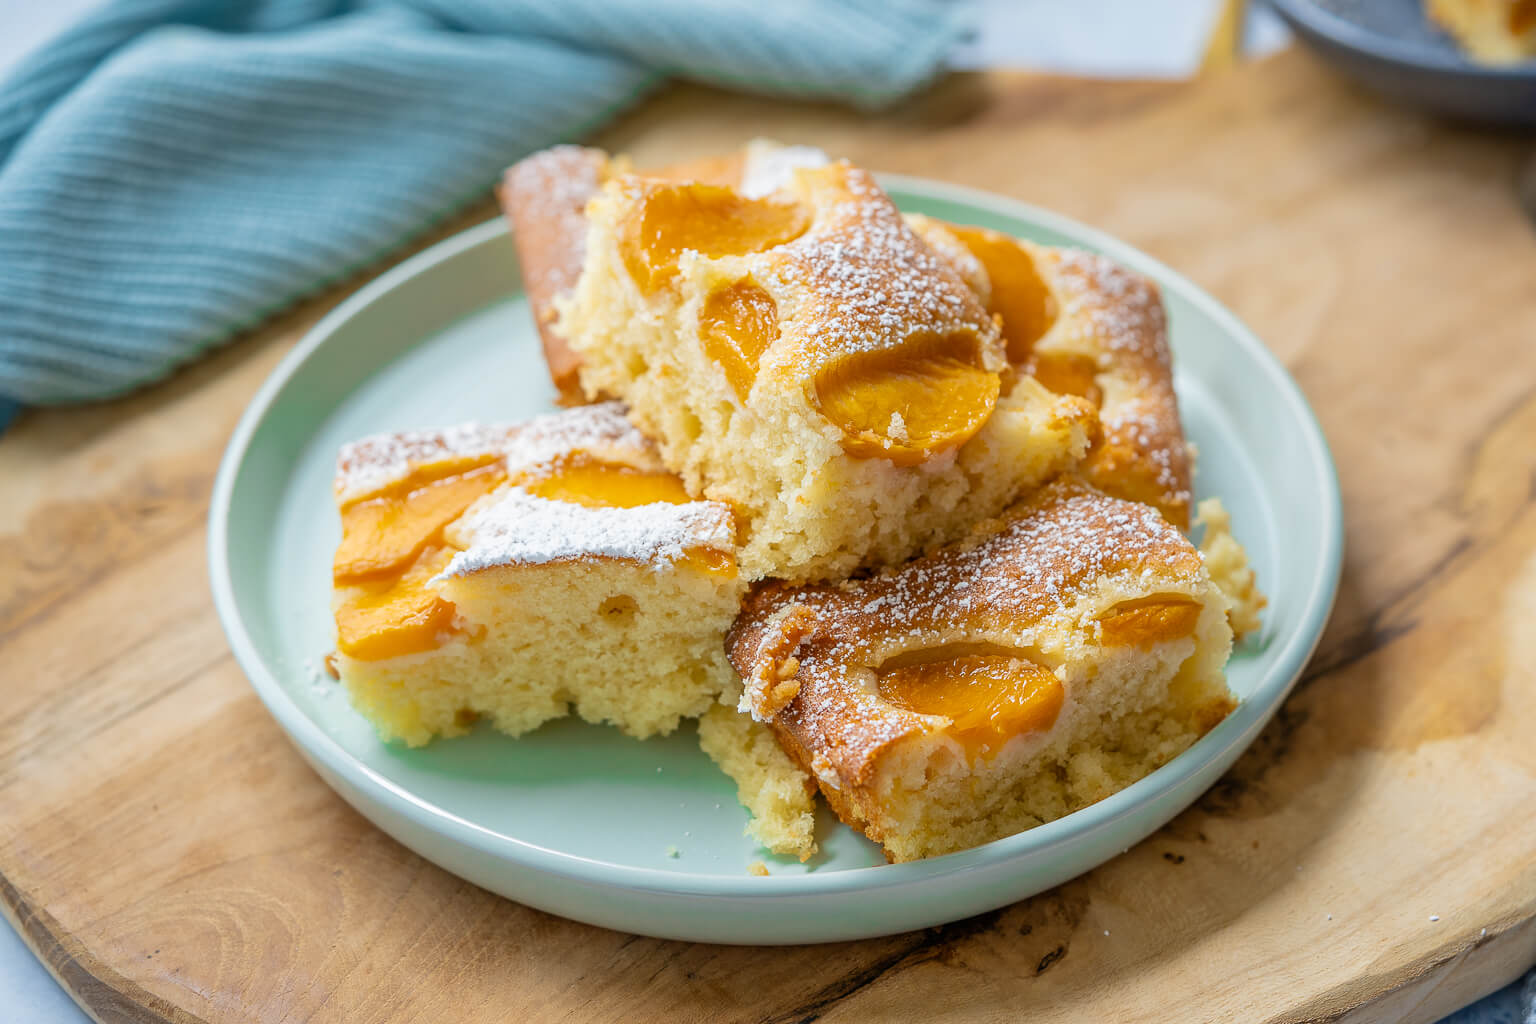 Pfirsich Joghurt Kuchen